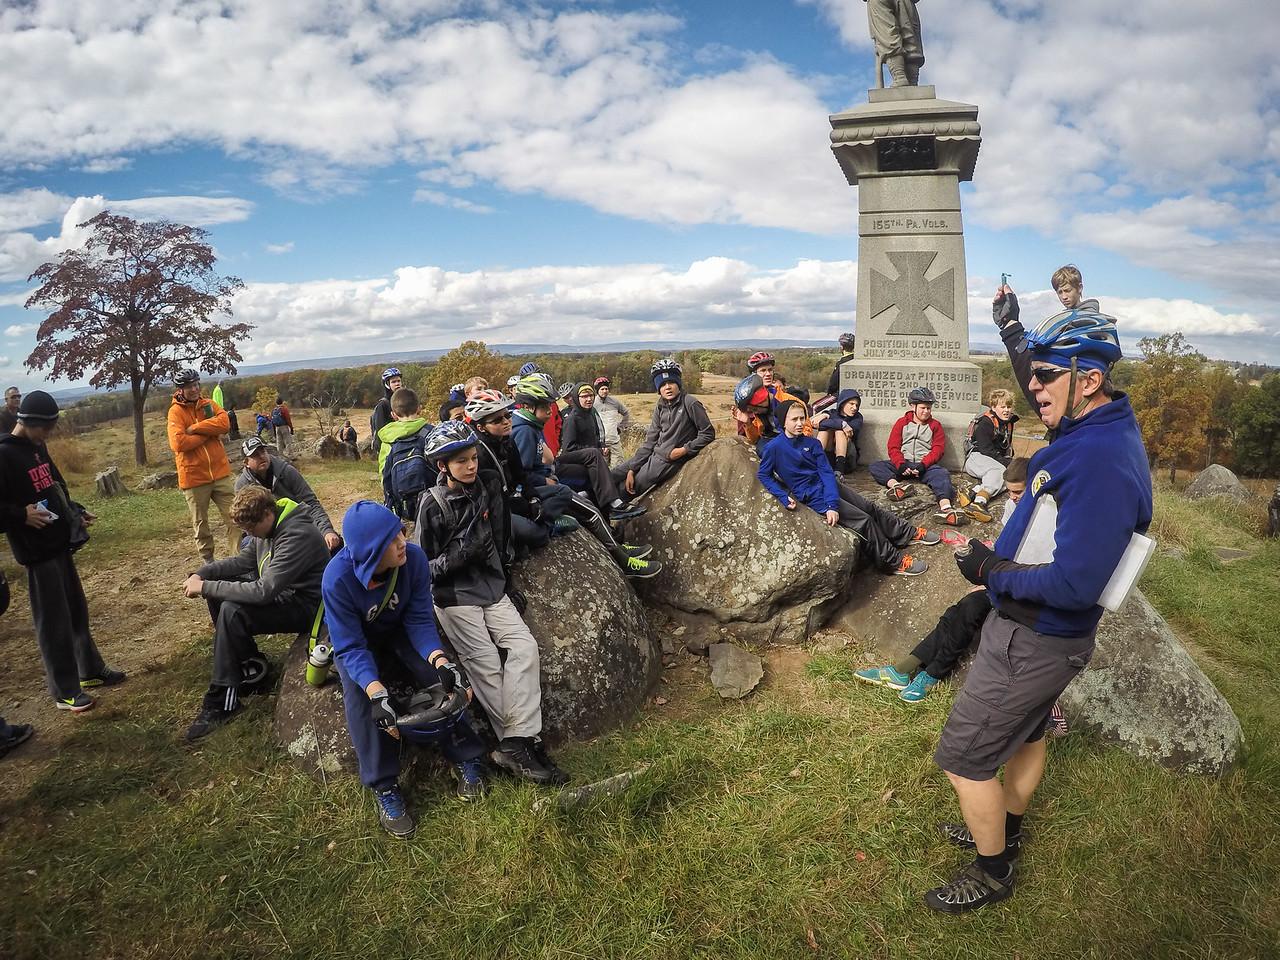 155th Pennsylvania Volunteer Infantry Regiment